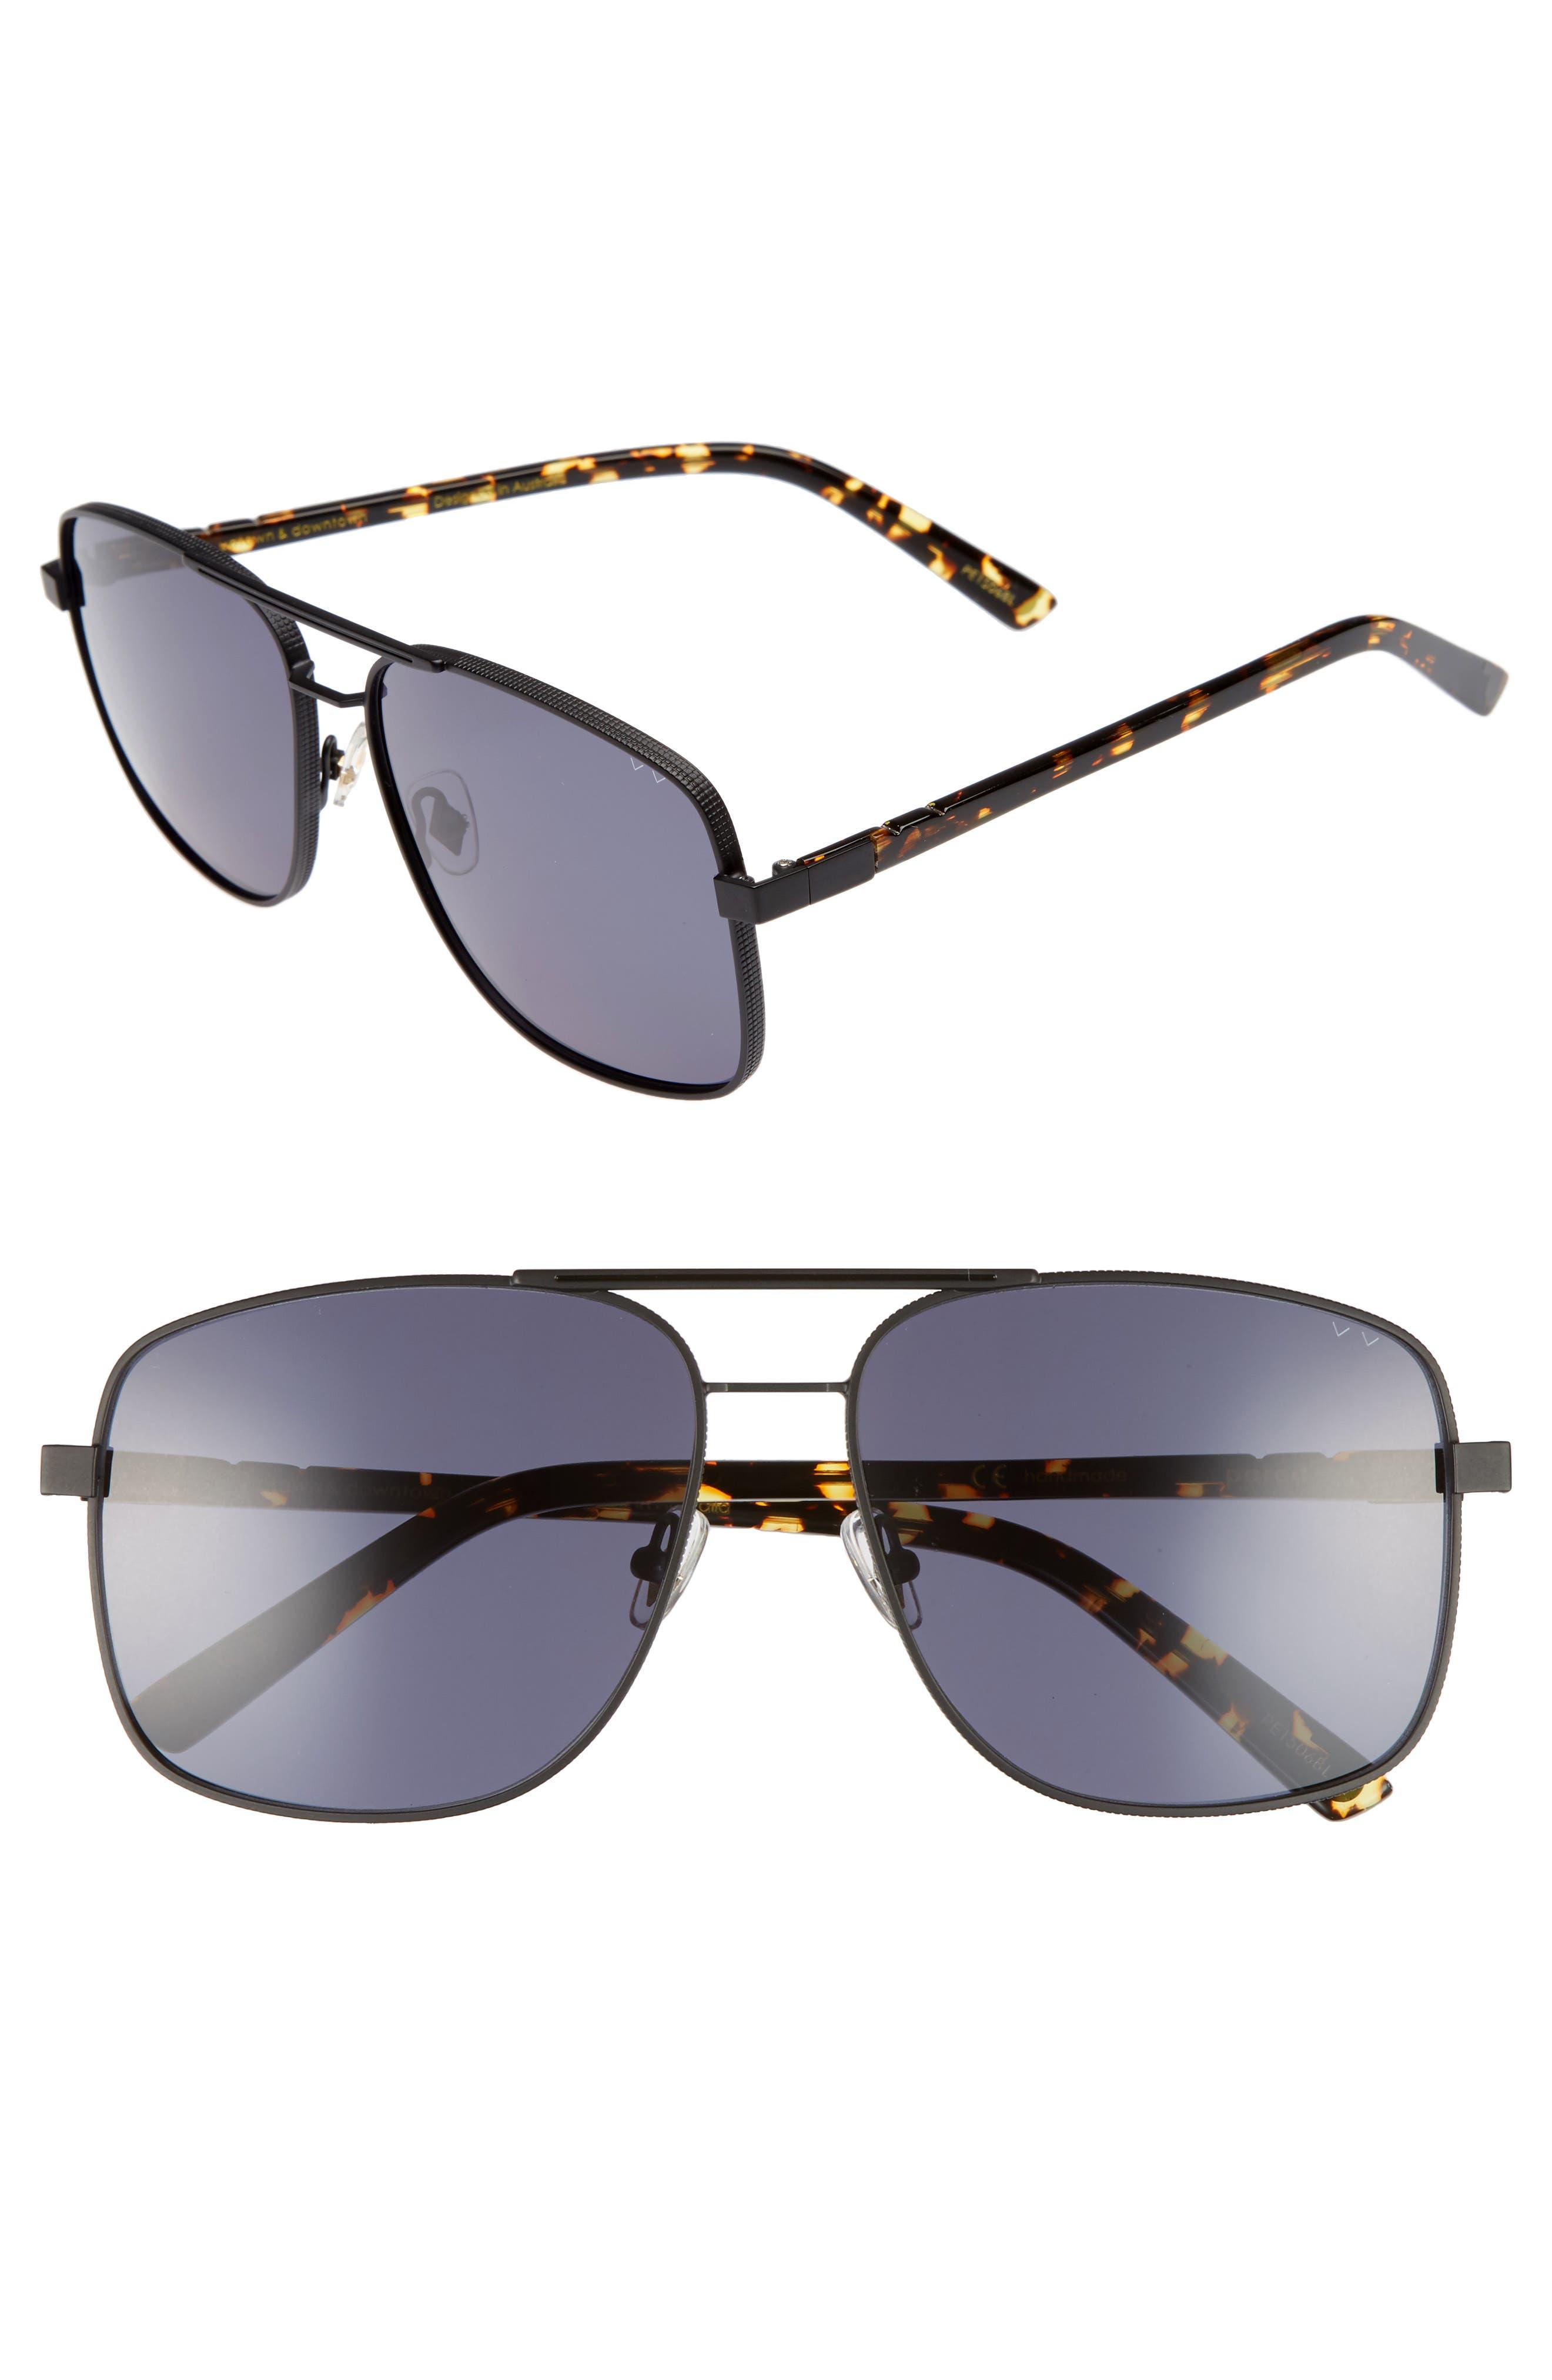 Main Image - Pared Uptown & Downtown 58mm Aviator Sunglasses